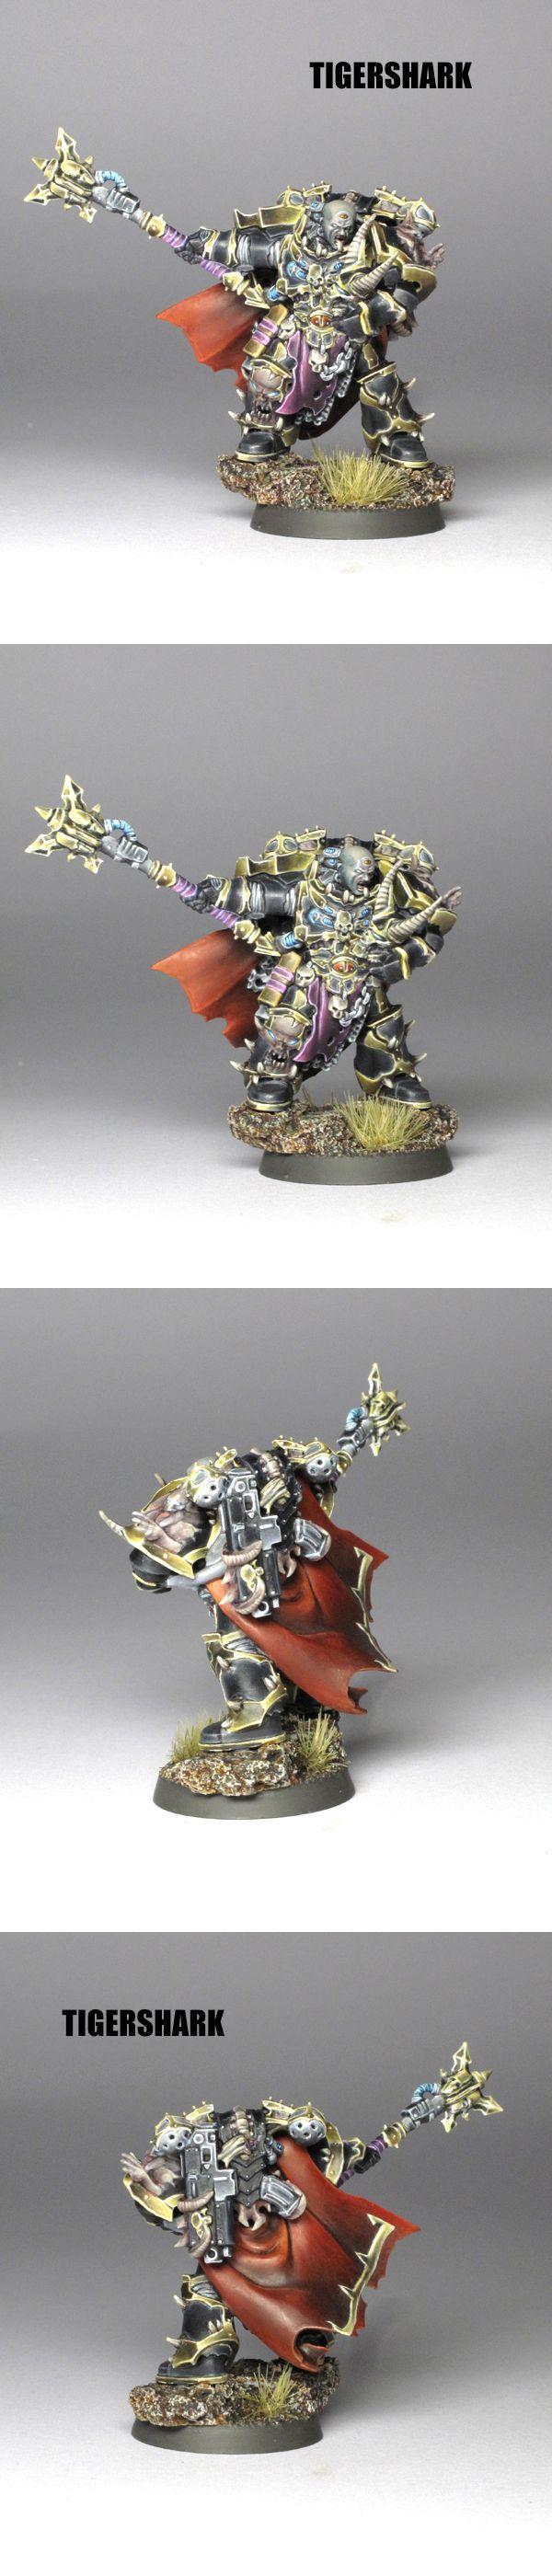 Black legion Chaos lord